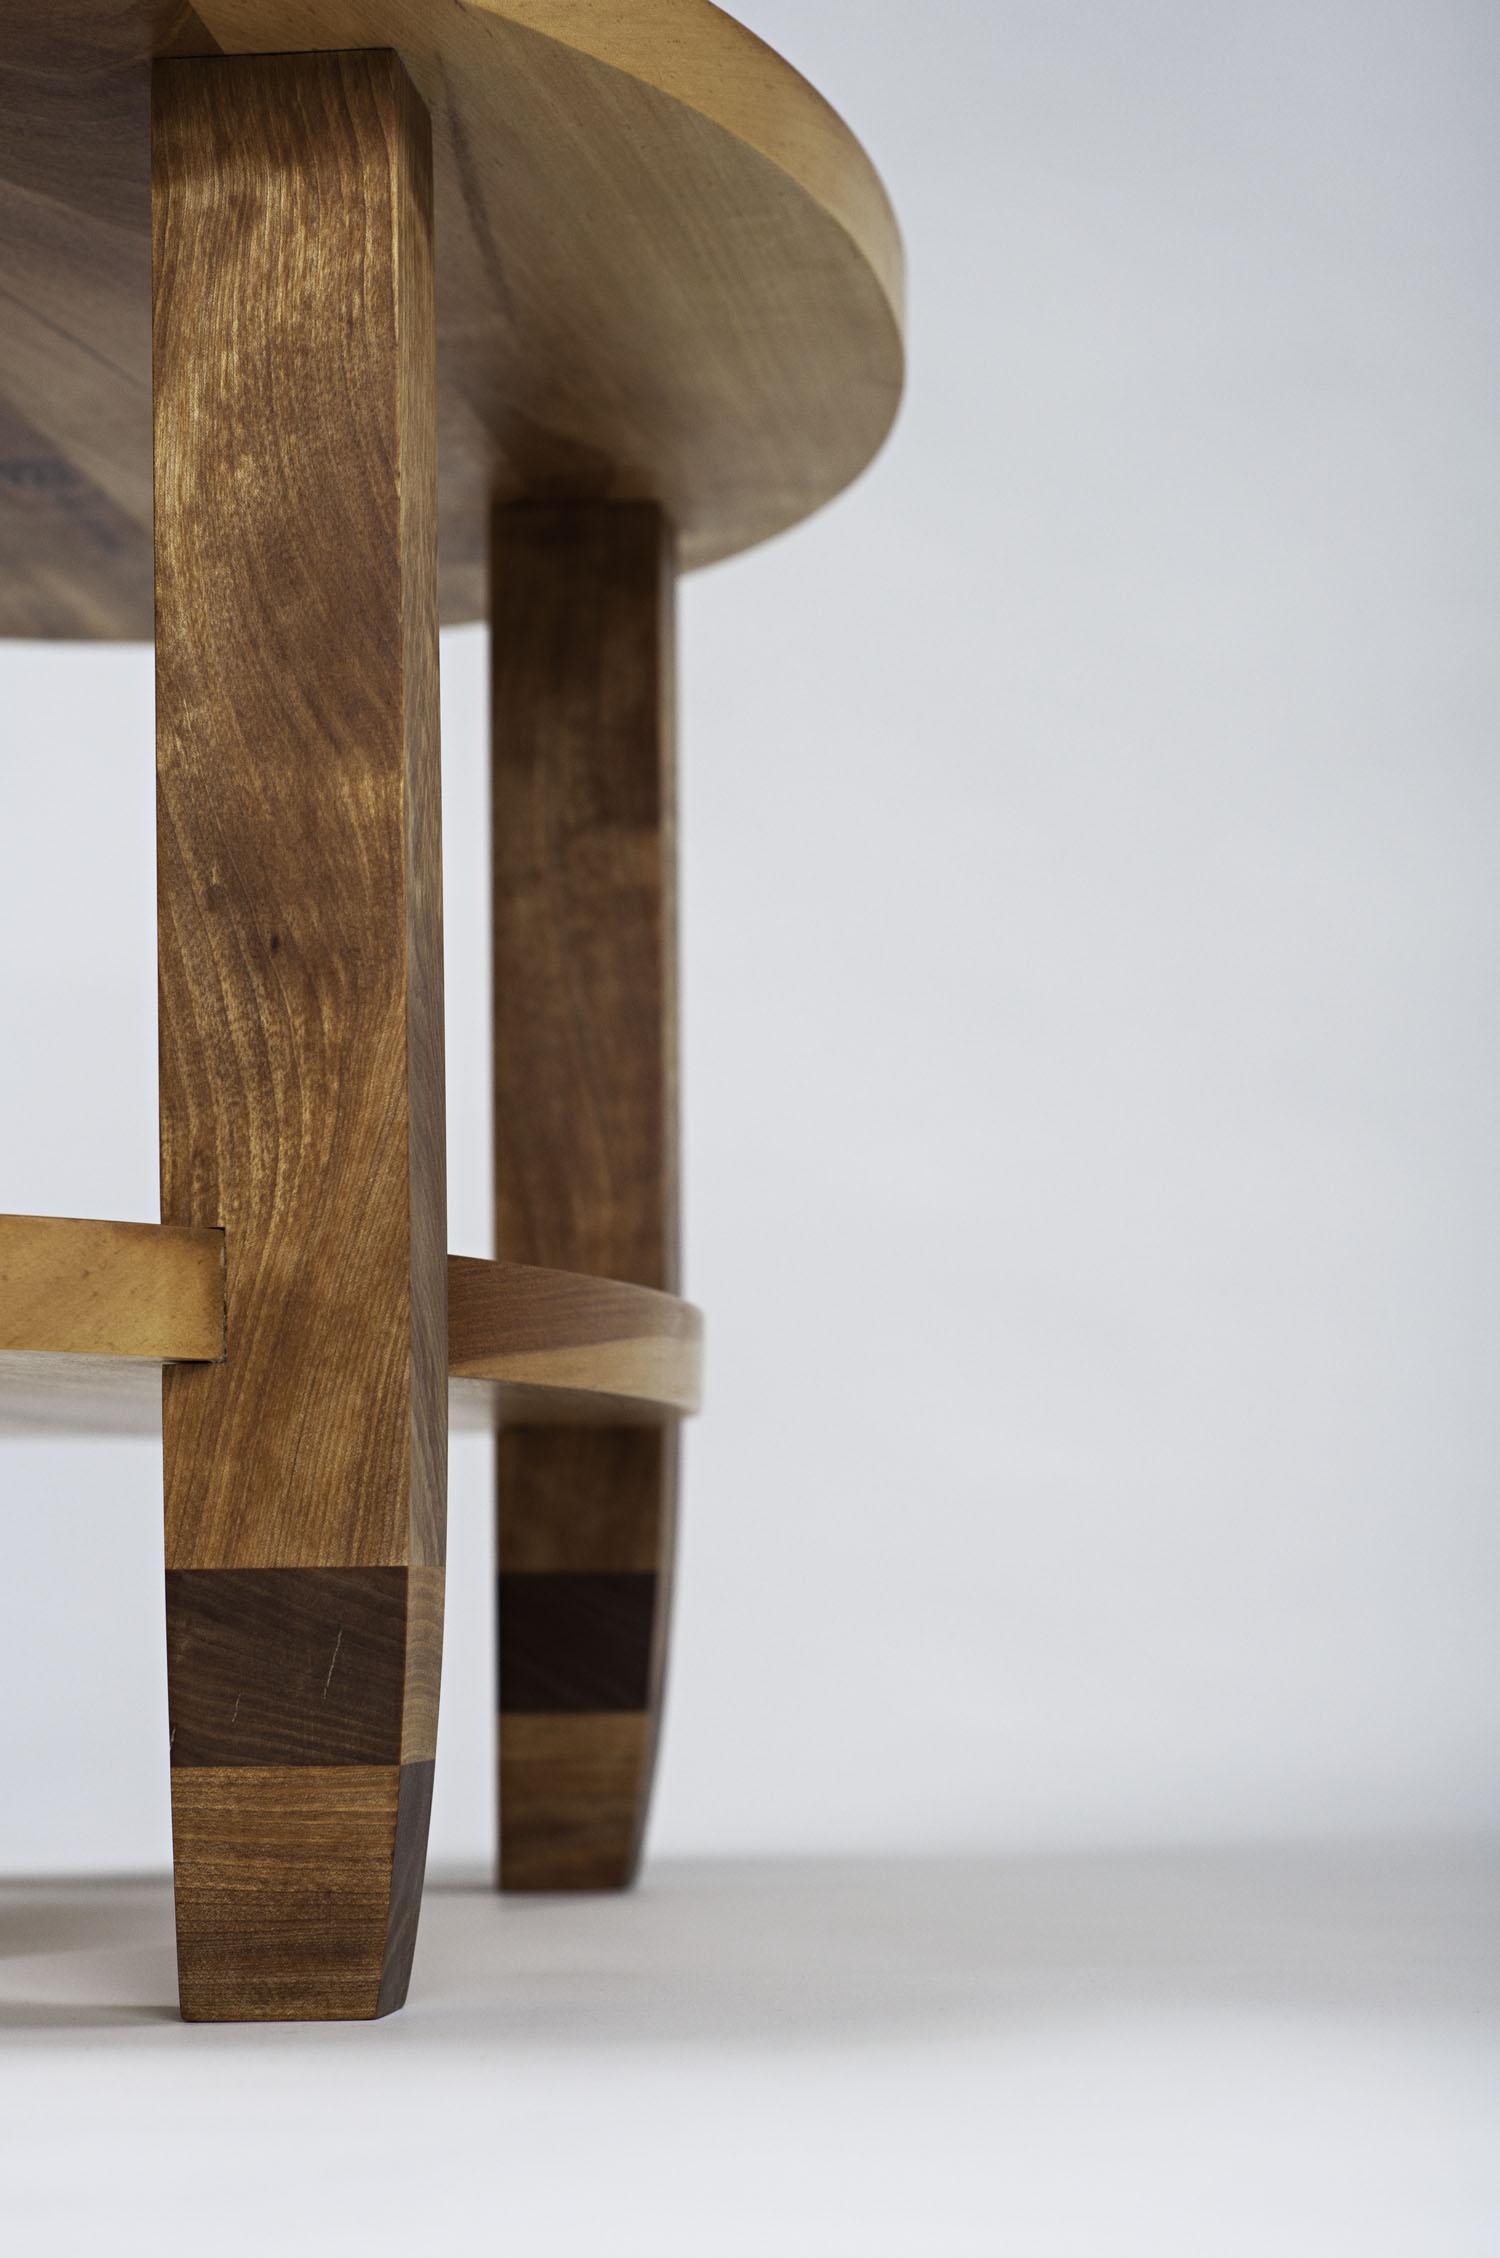 04_leg detail 01.jpg